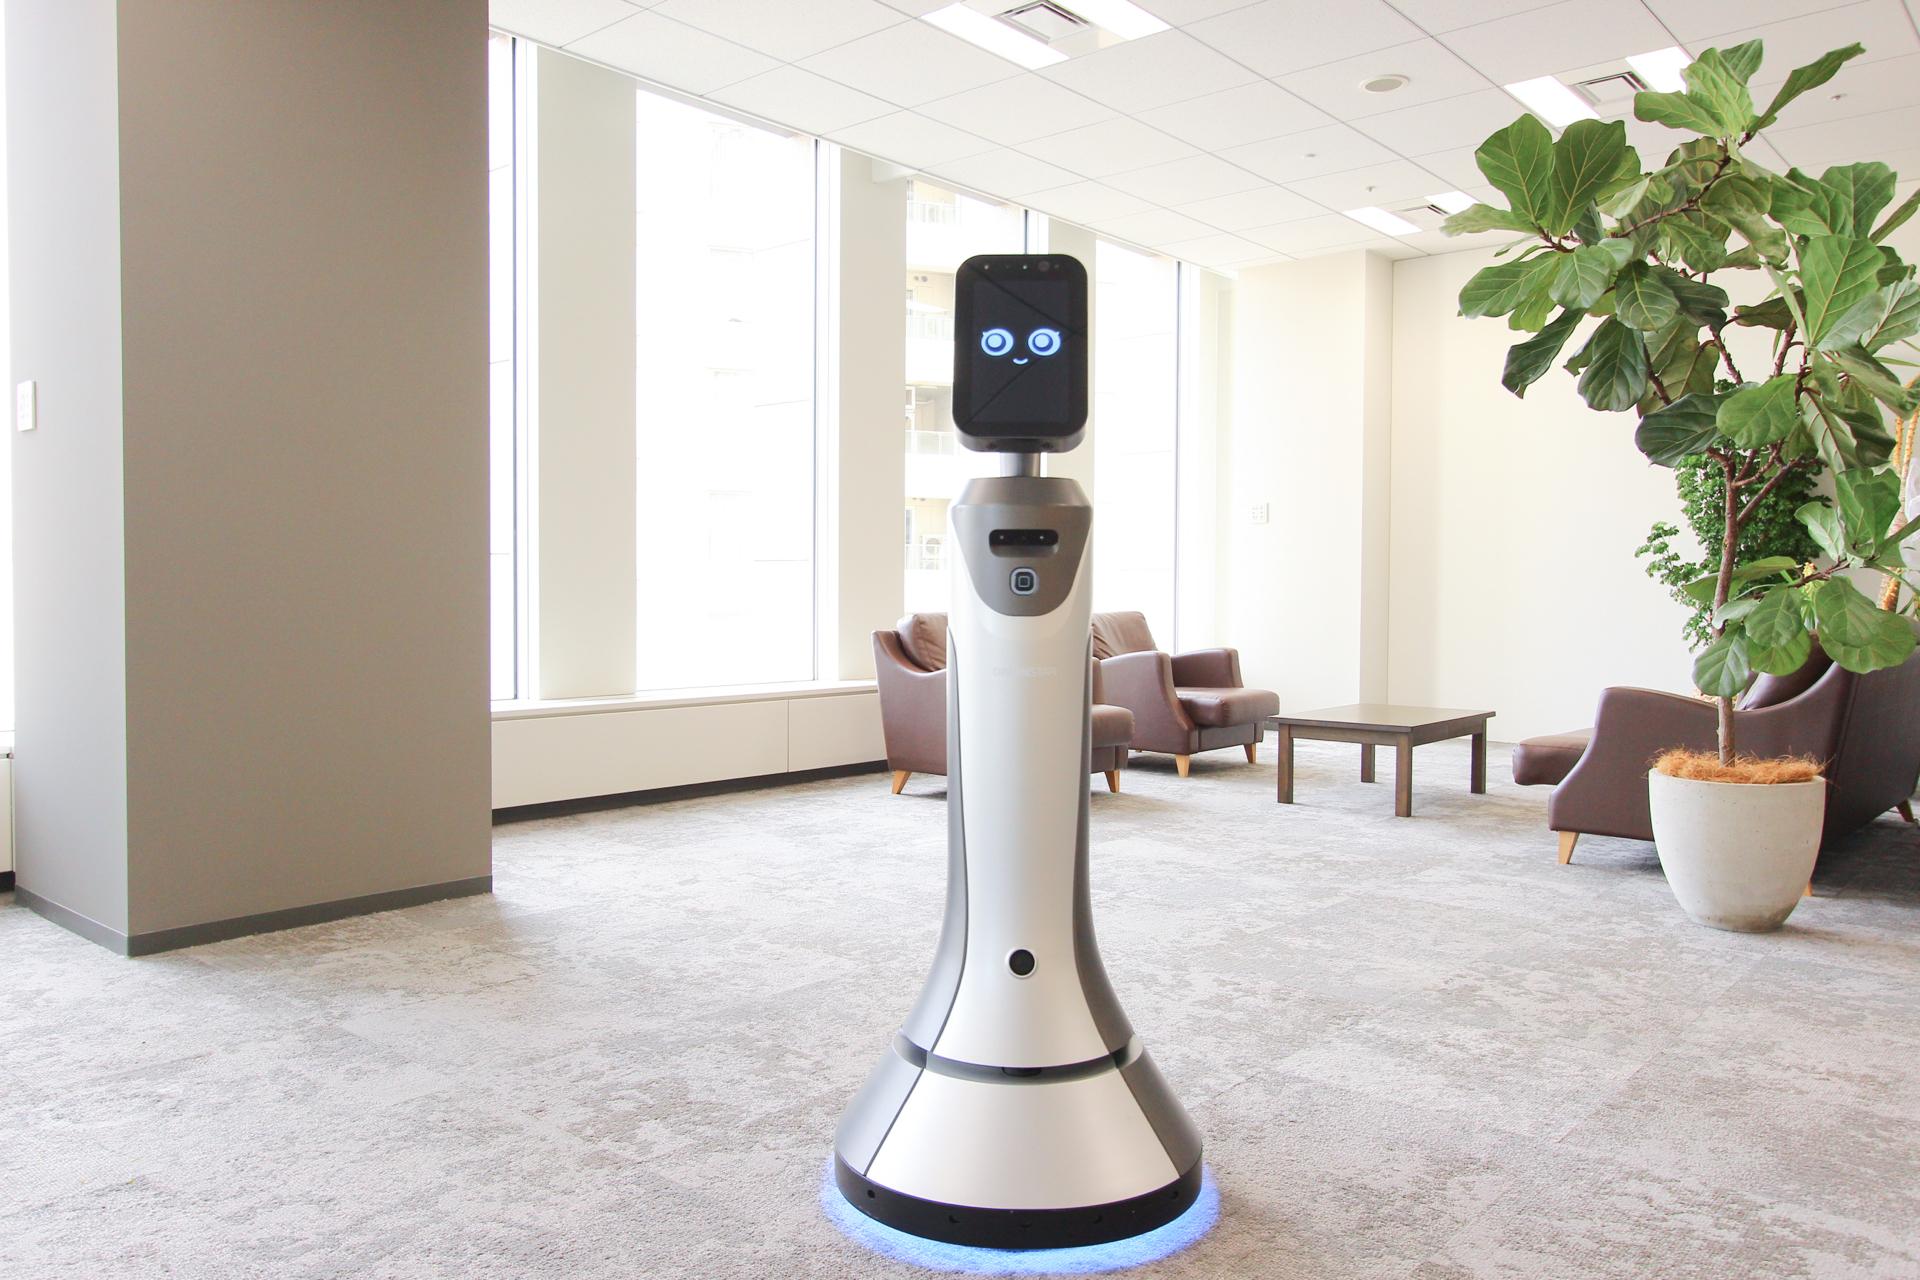 AIサービスロボット Lanky